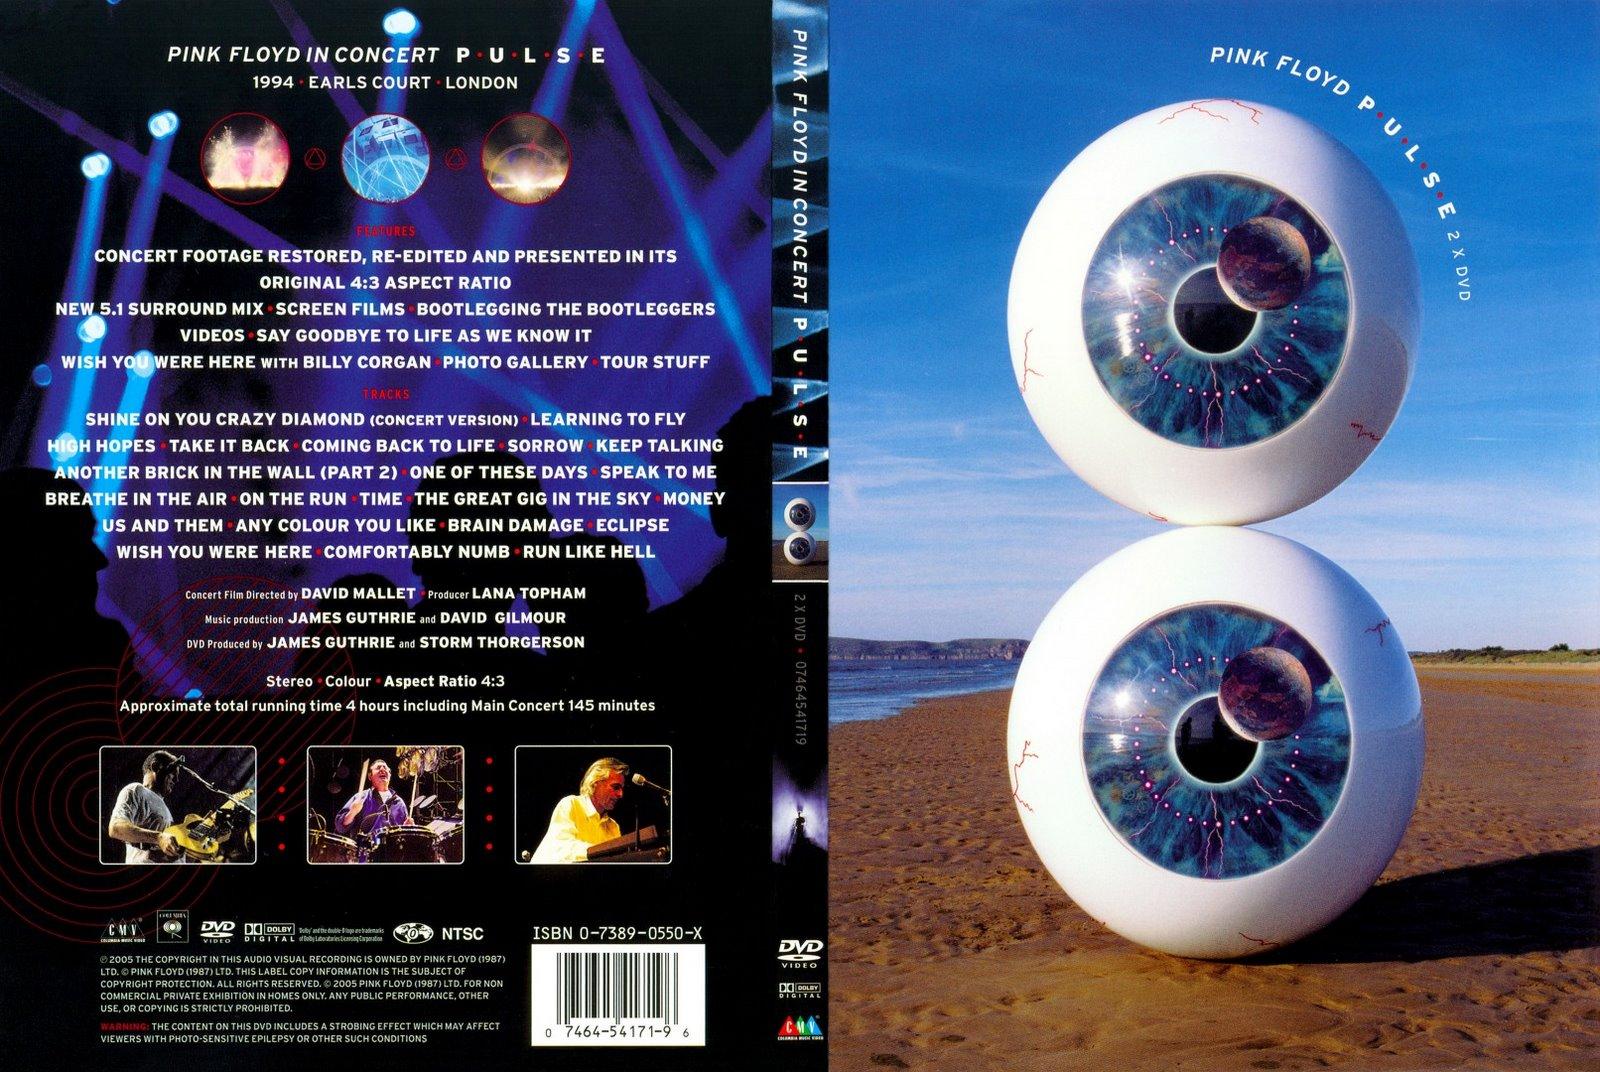 Capas Medina - Somente Capas de DVD: Pink Floyd - Pulse